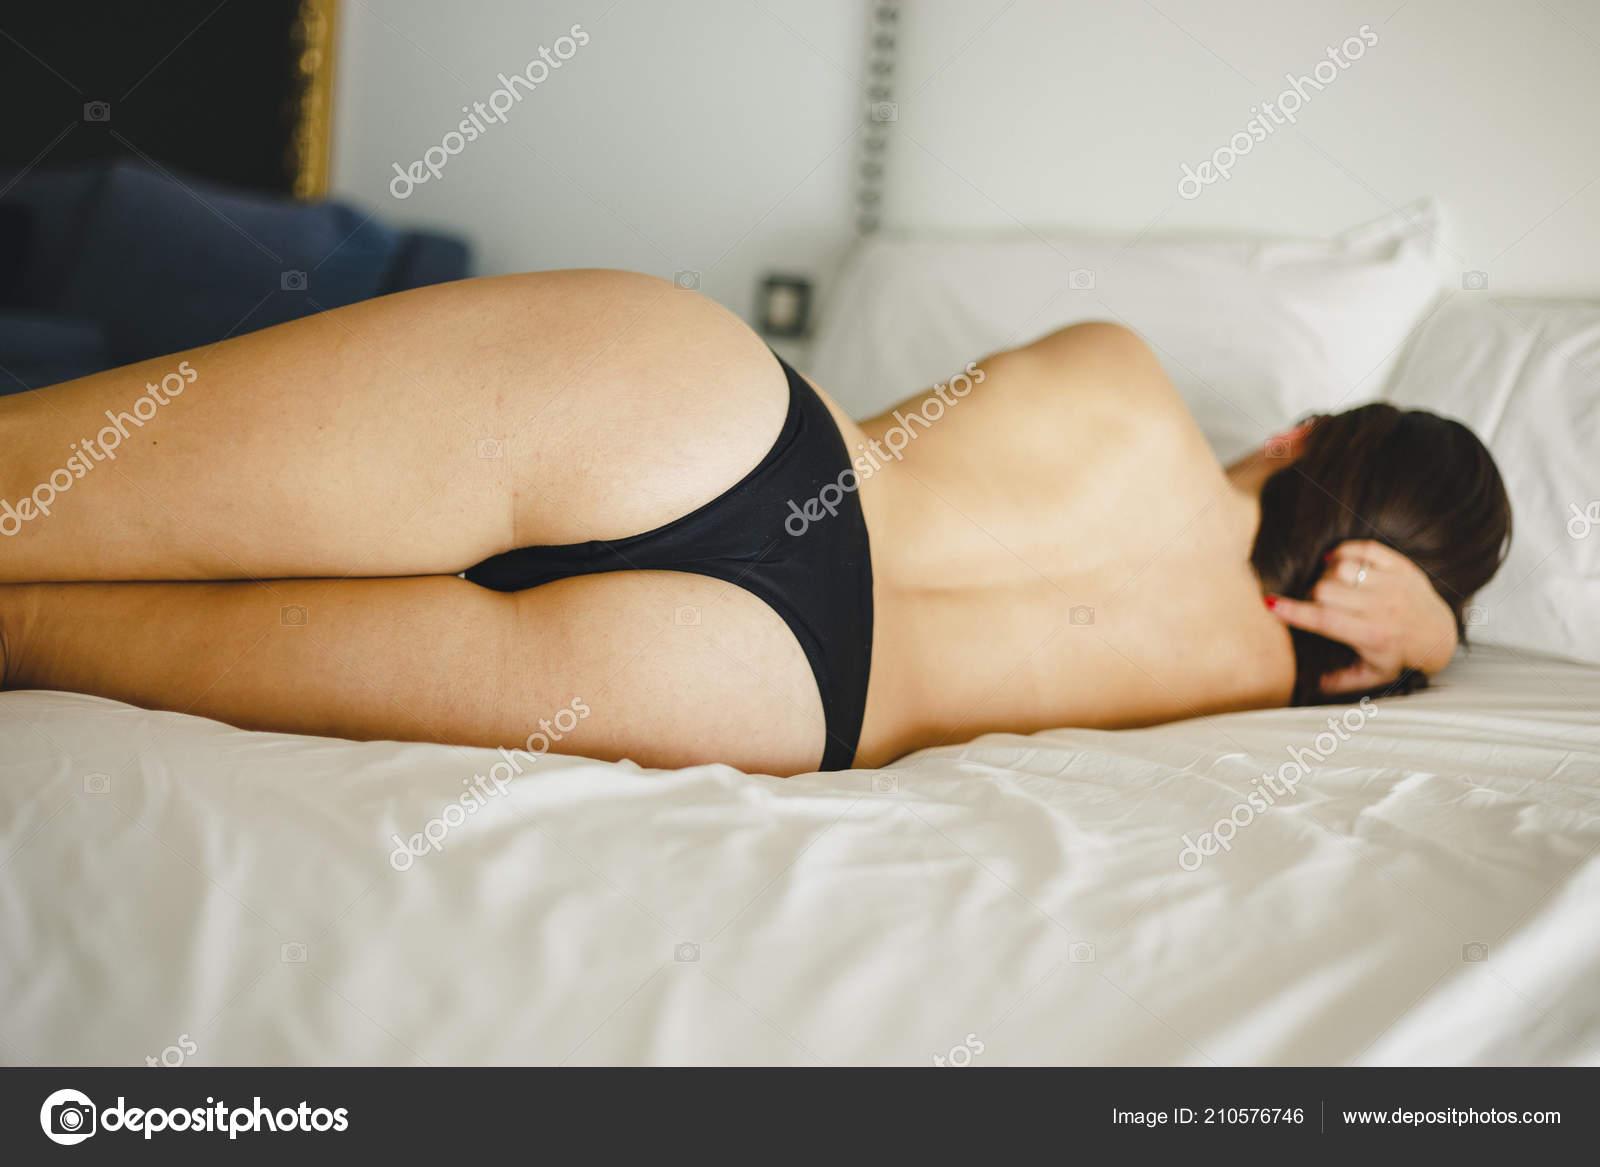 sexy Black cul pic mature jouir pics